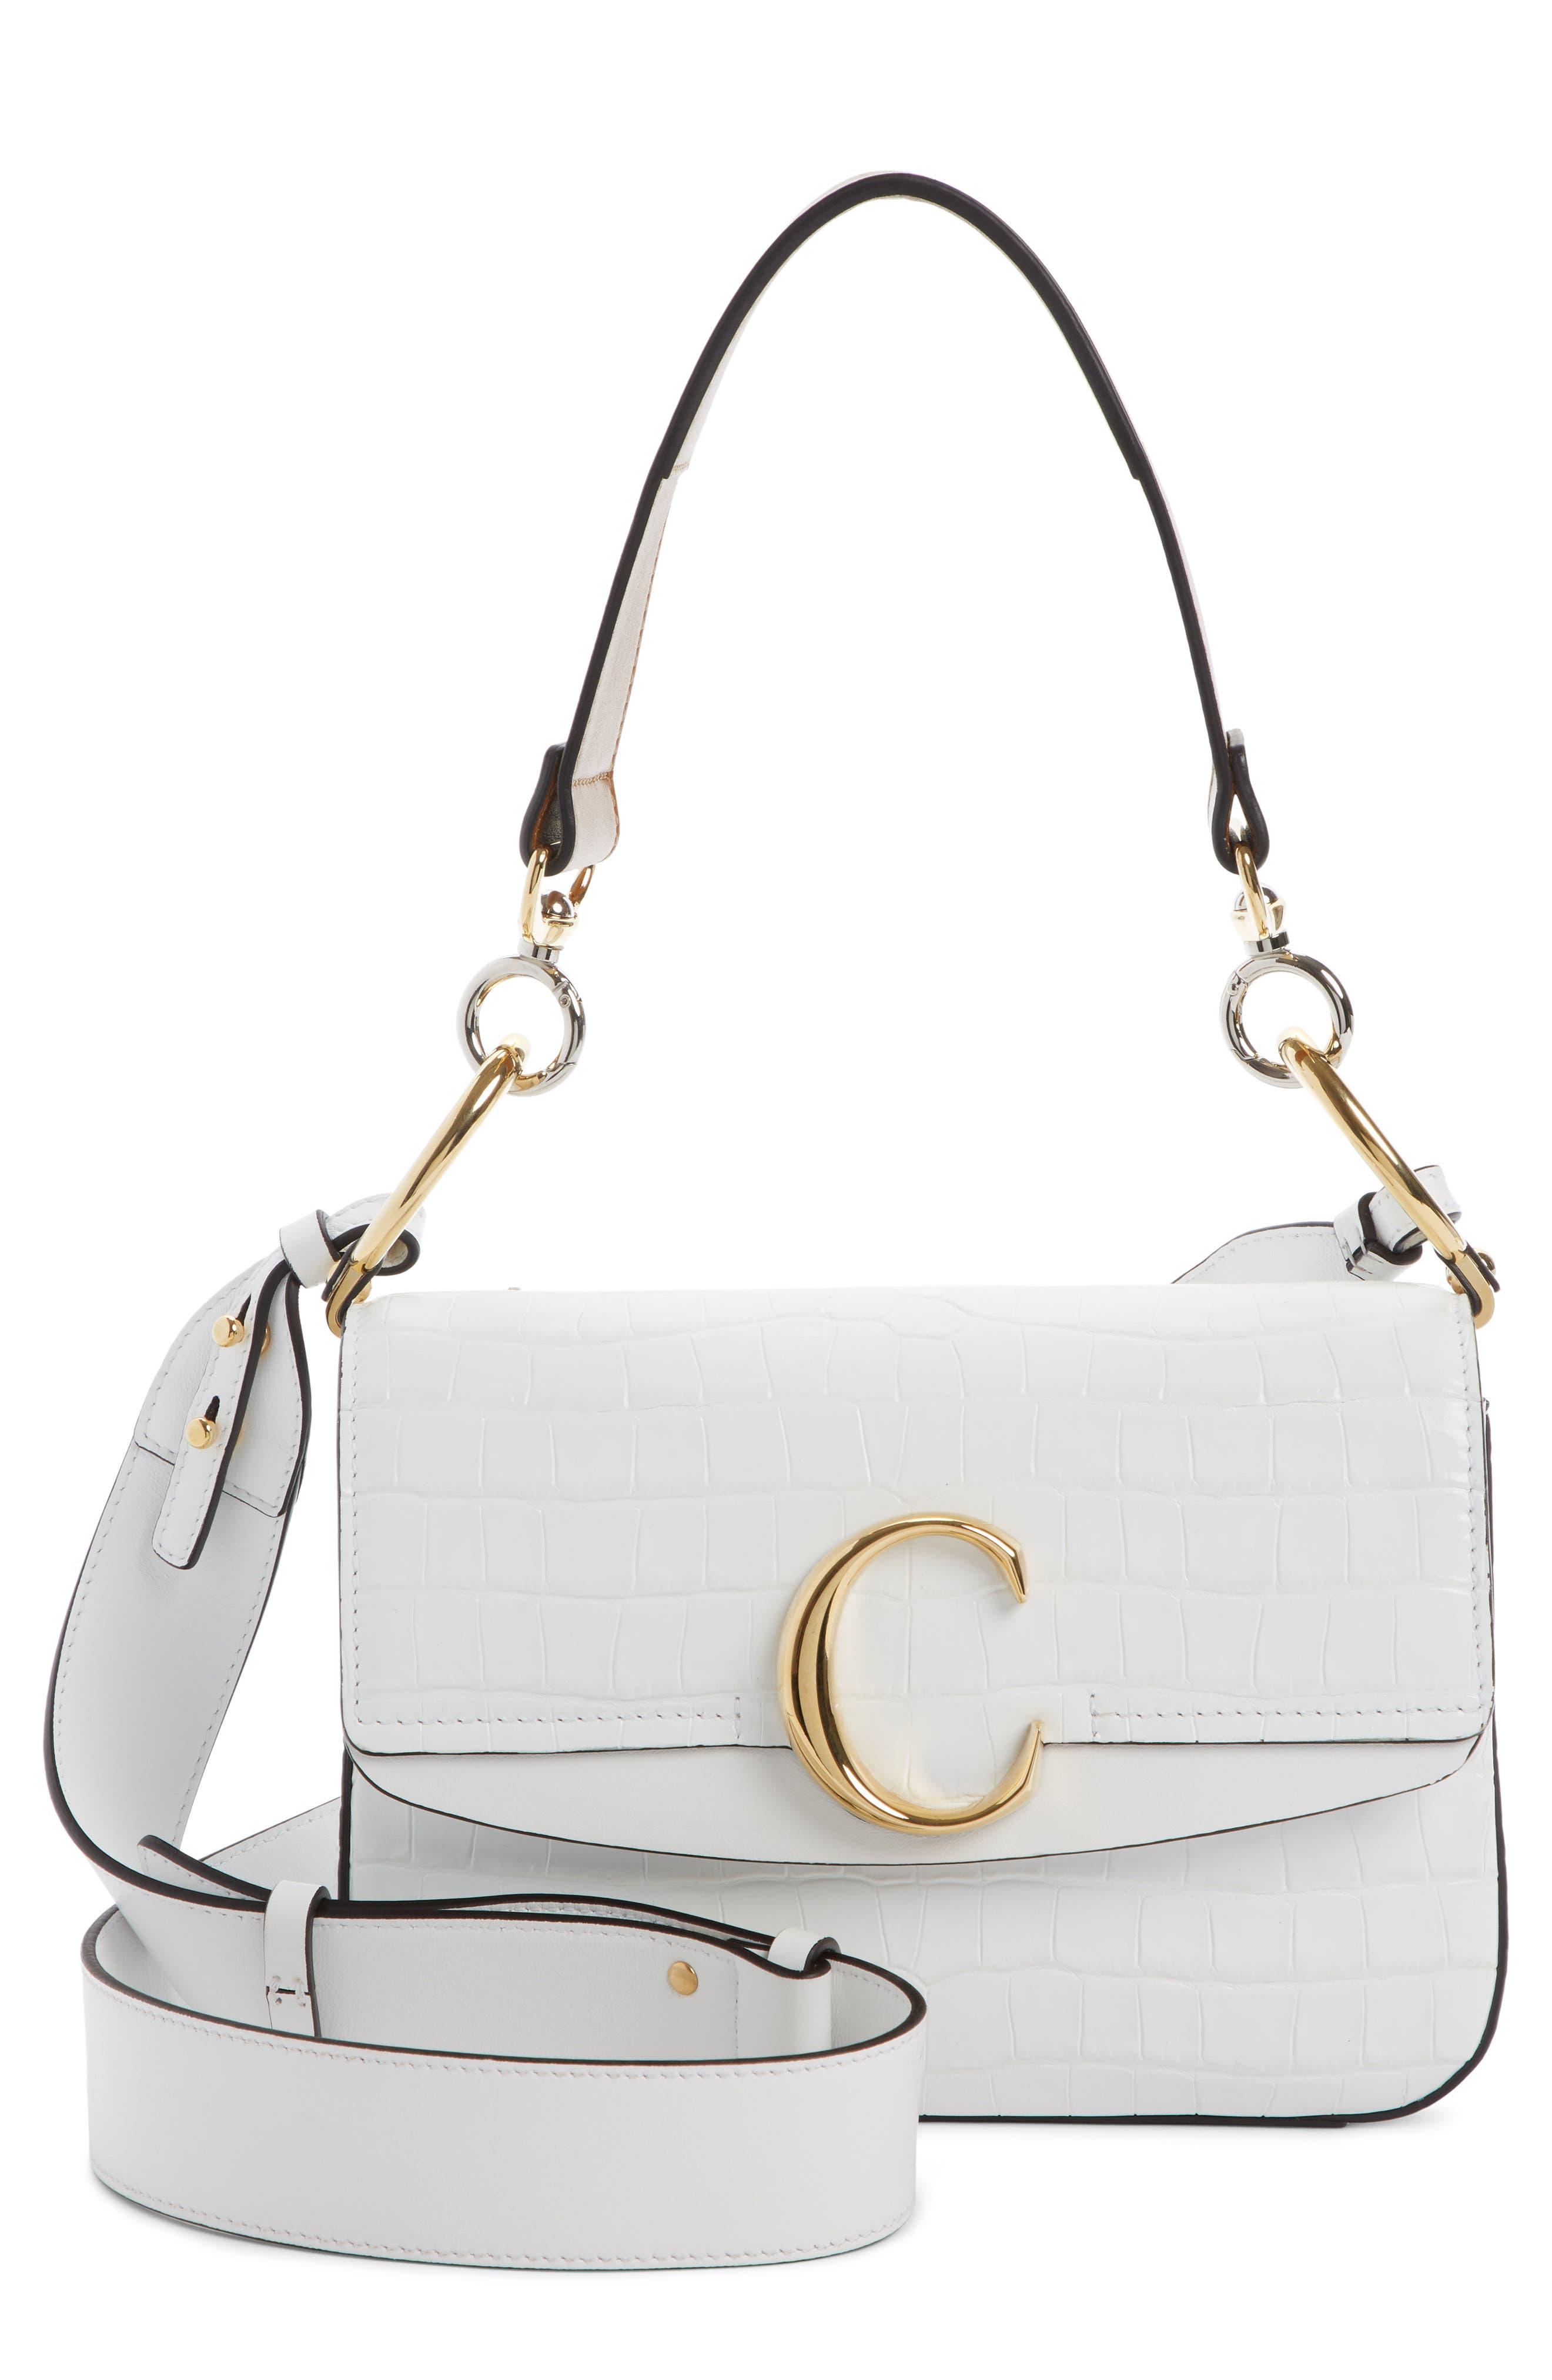 Croc Embossed Leather Shoulder Bag,                             Main thumbnail 1, color,                             BRILLIANT WHITE